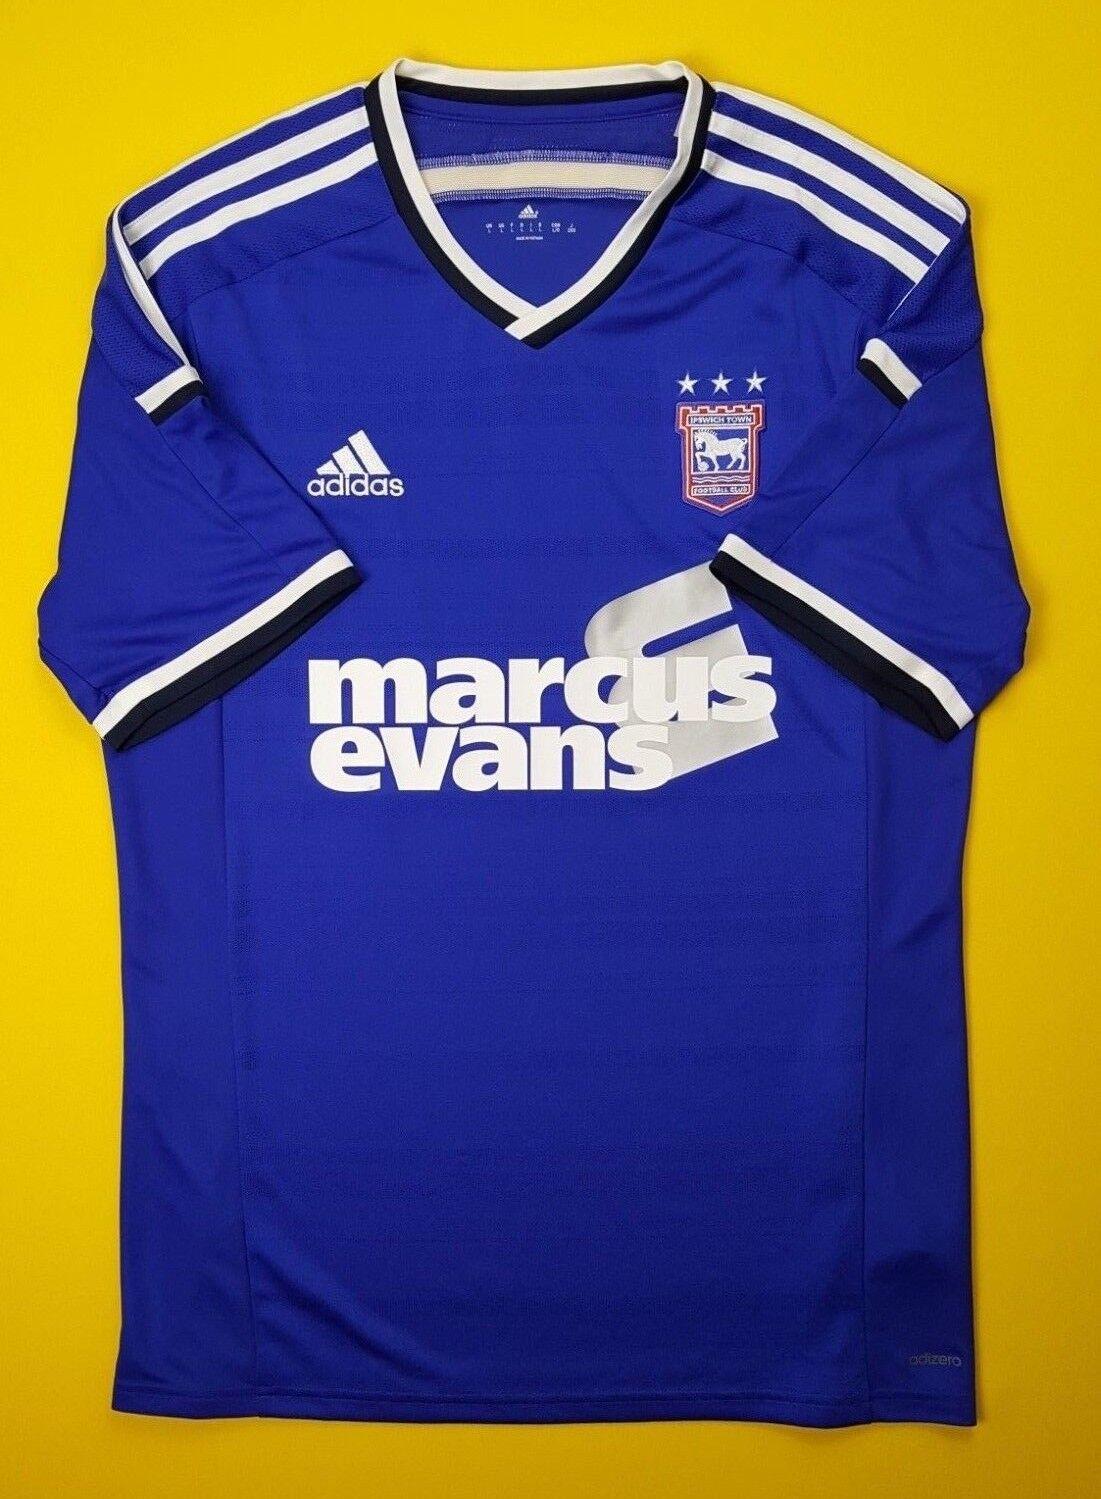 Ipswich Town adizero jersey shirt LARGE 2014 2015 home M36151 soccer Adidas ig93